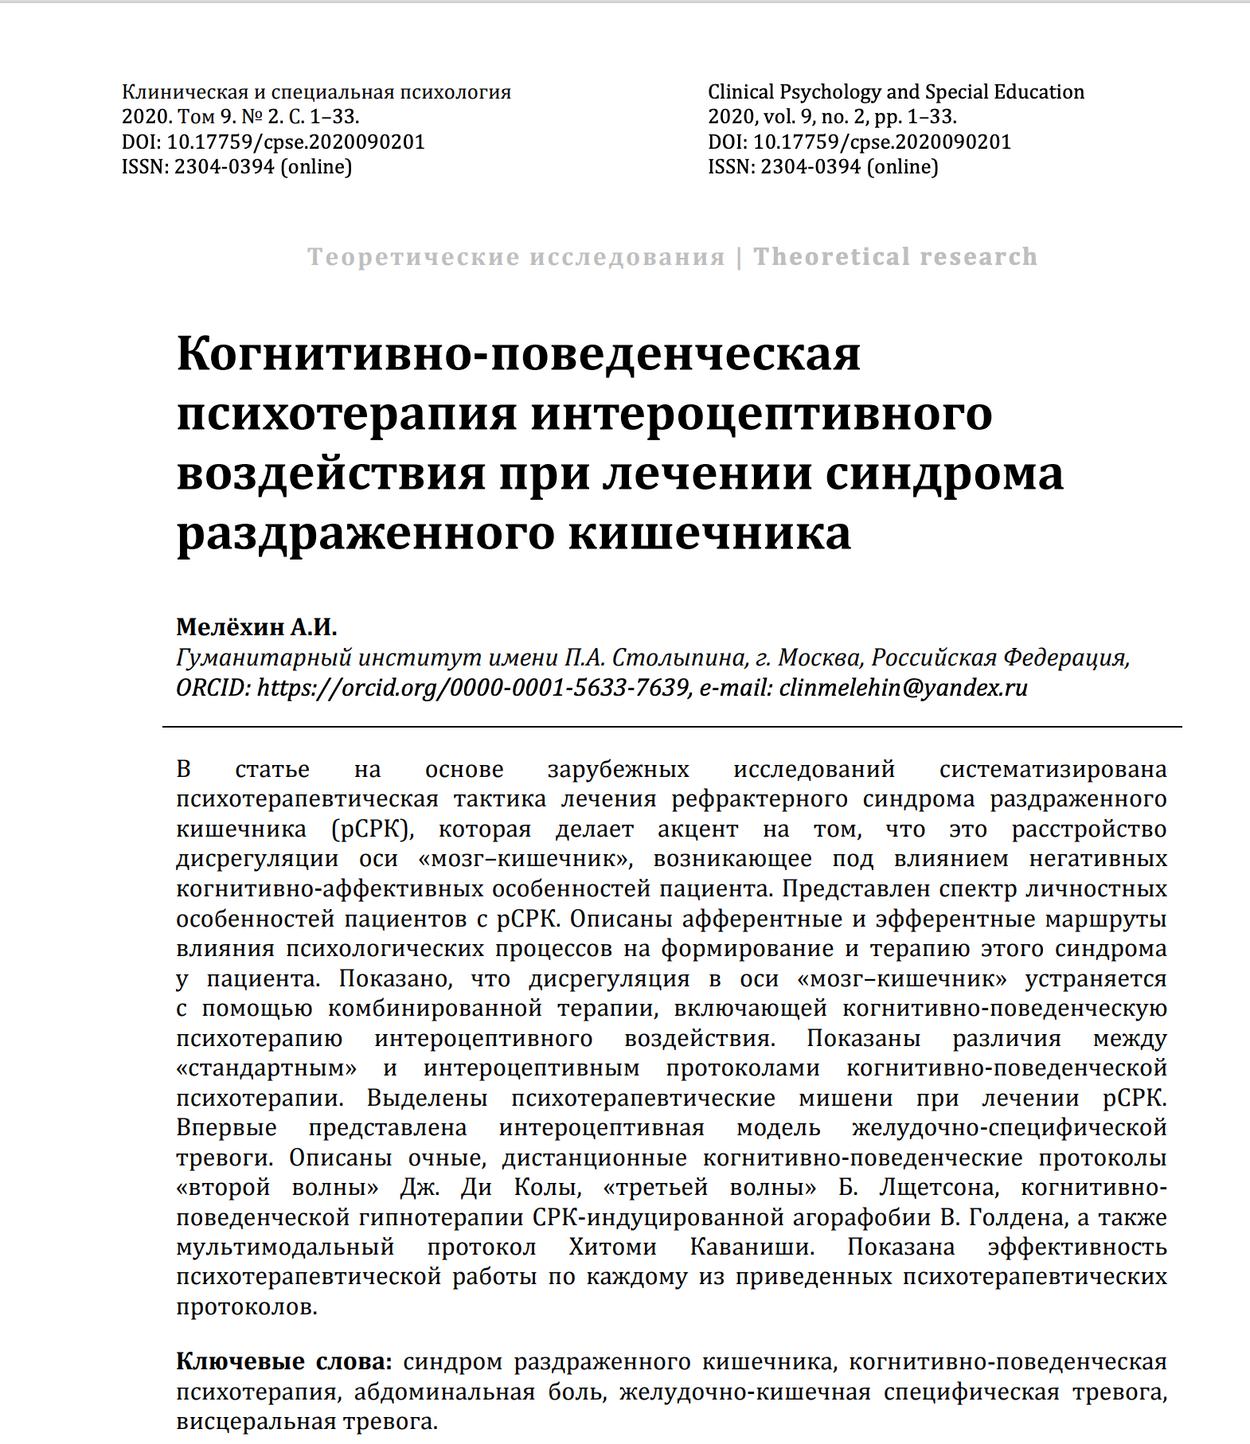 Алексей Мелехин о синдроме раздраженного кишечника